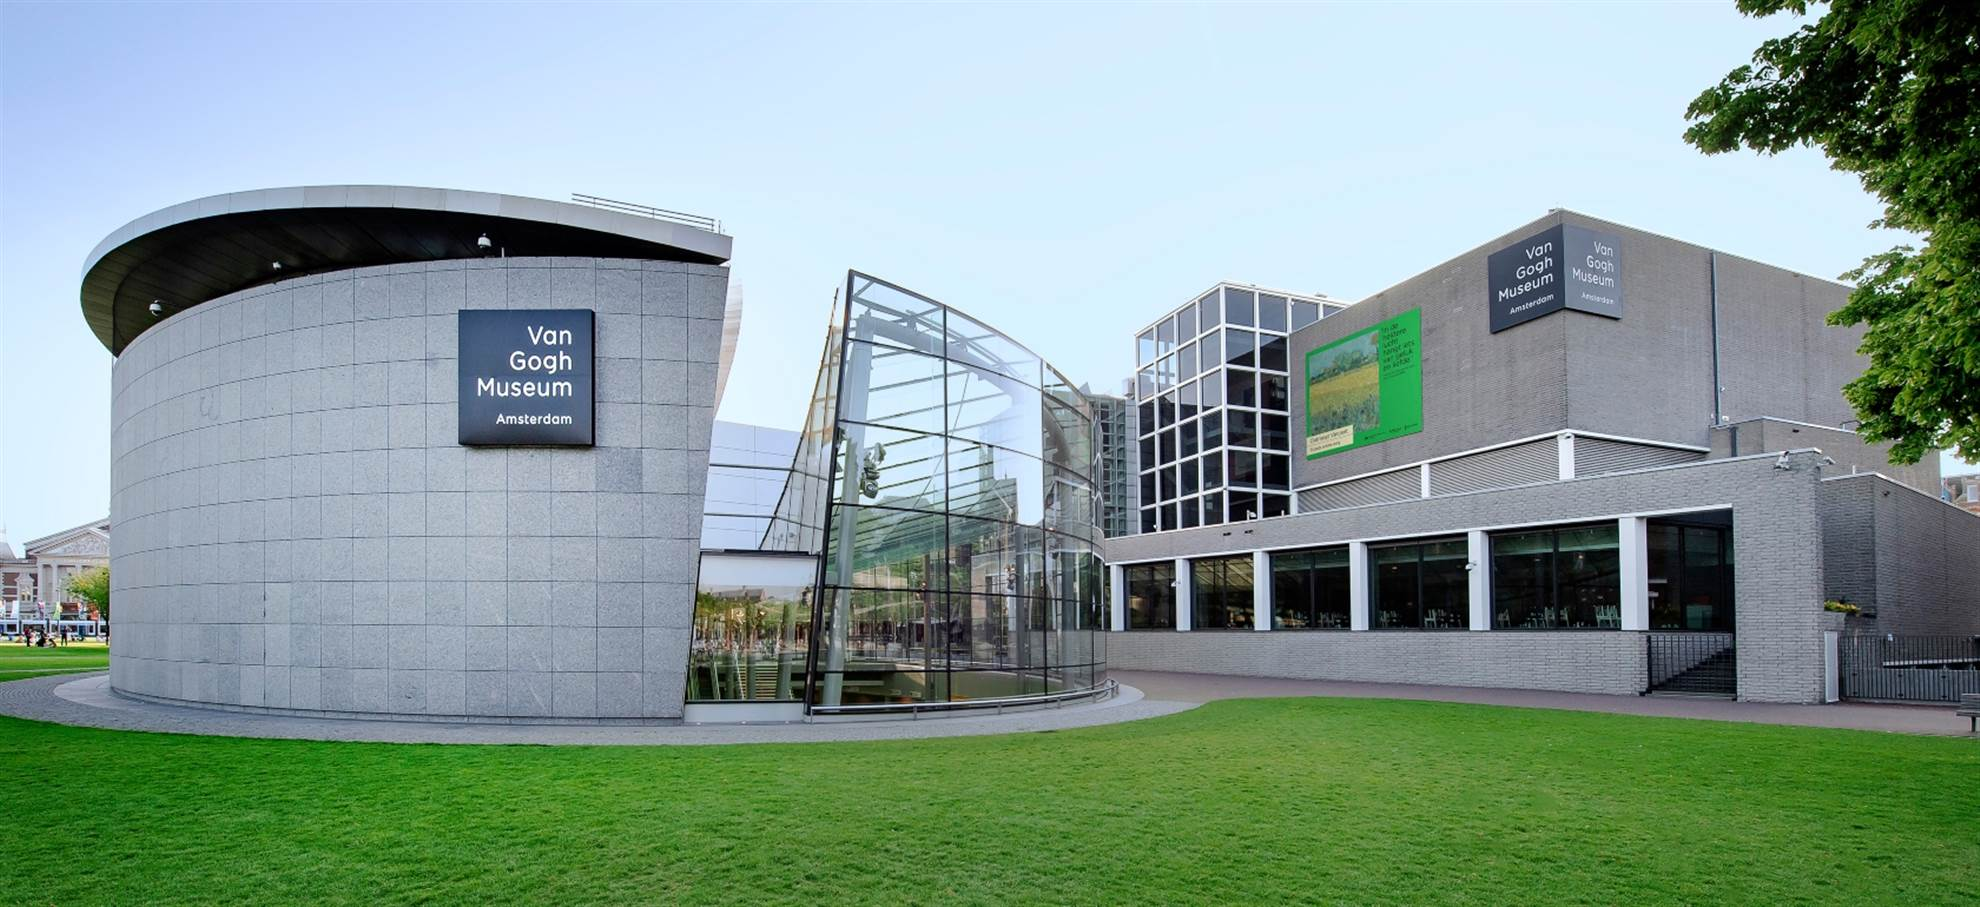 Круиз по каналам и музей Ван Гога